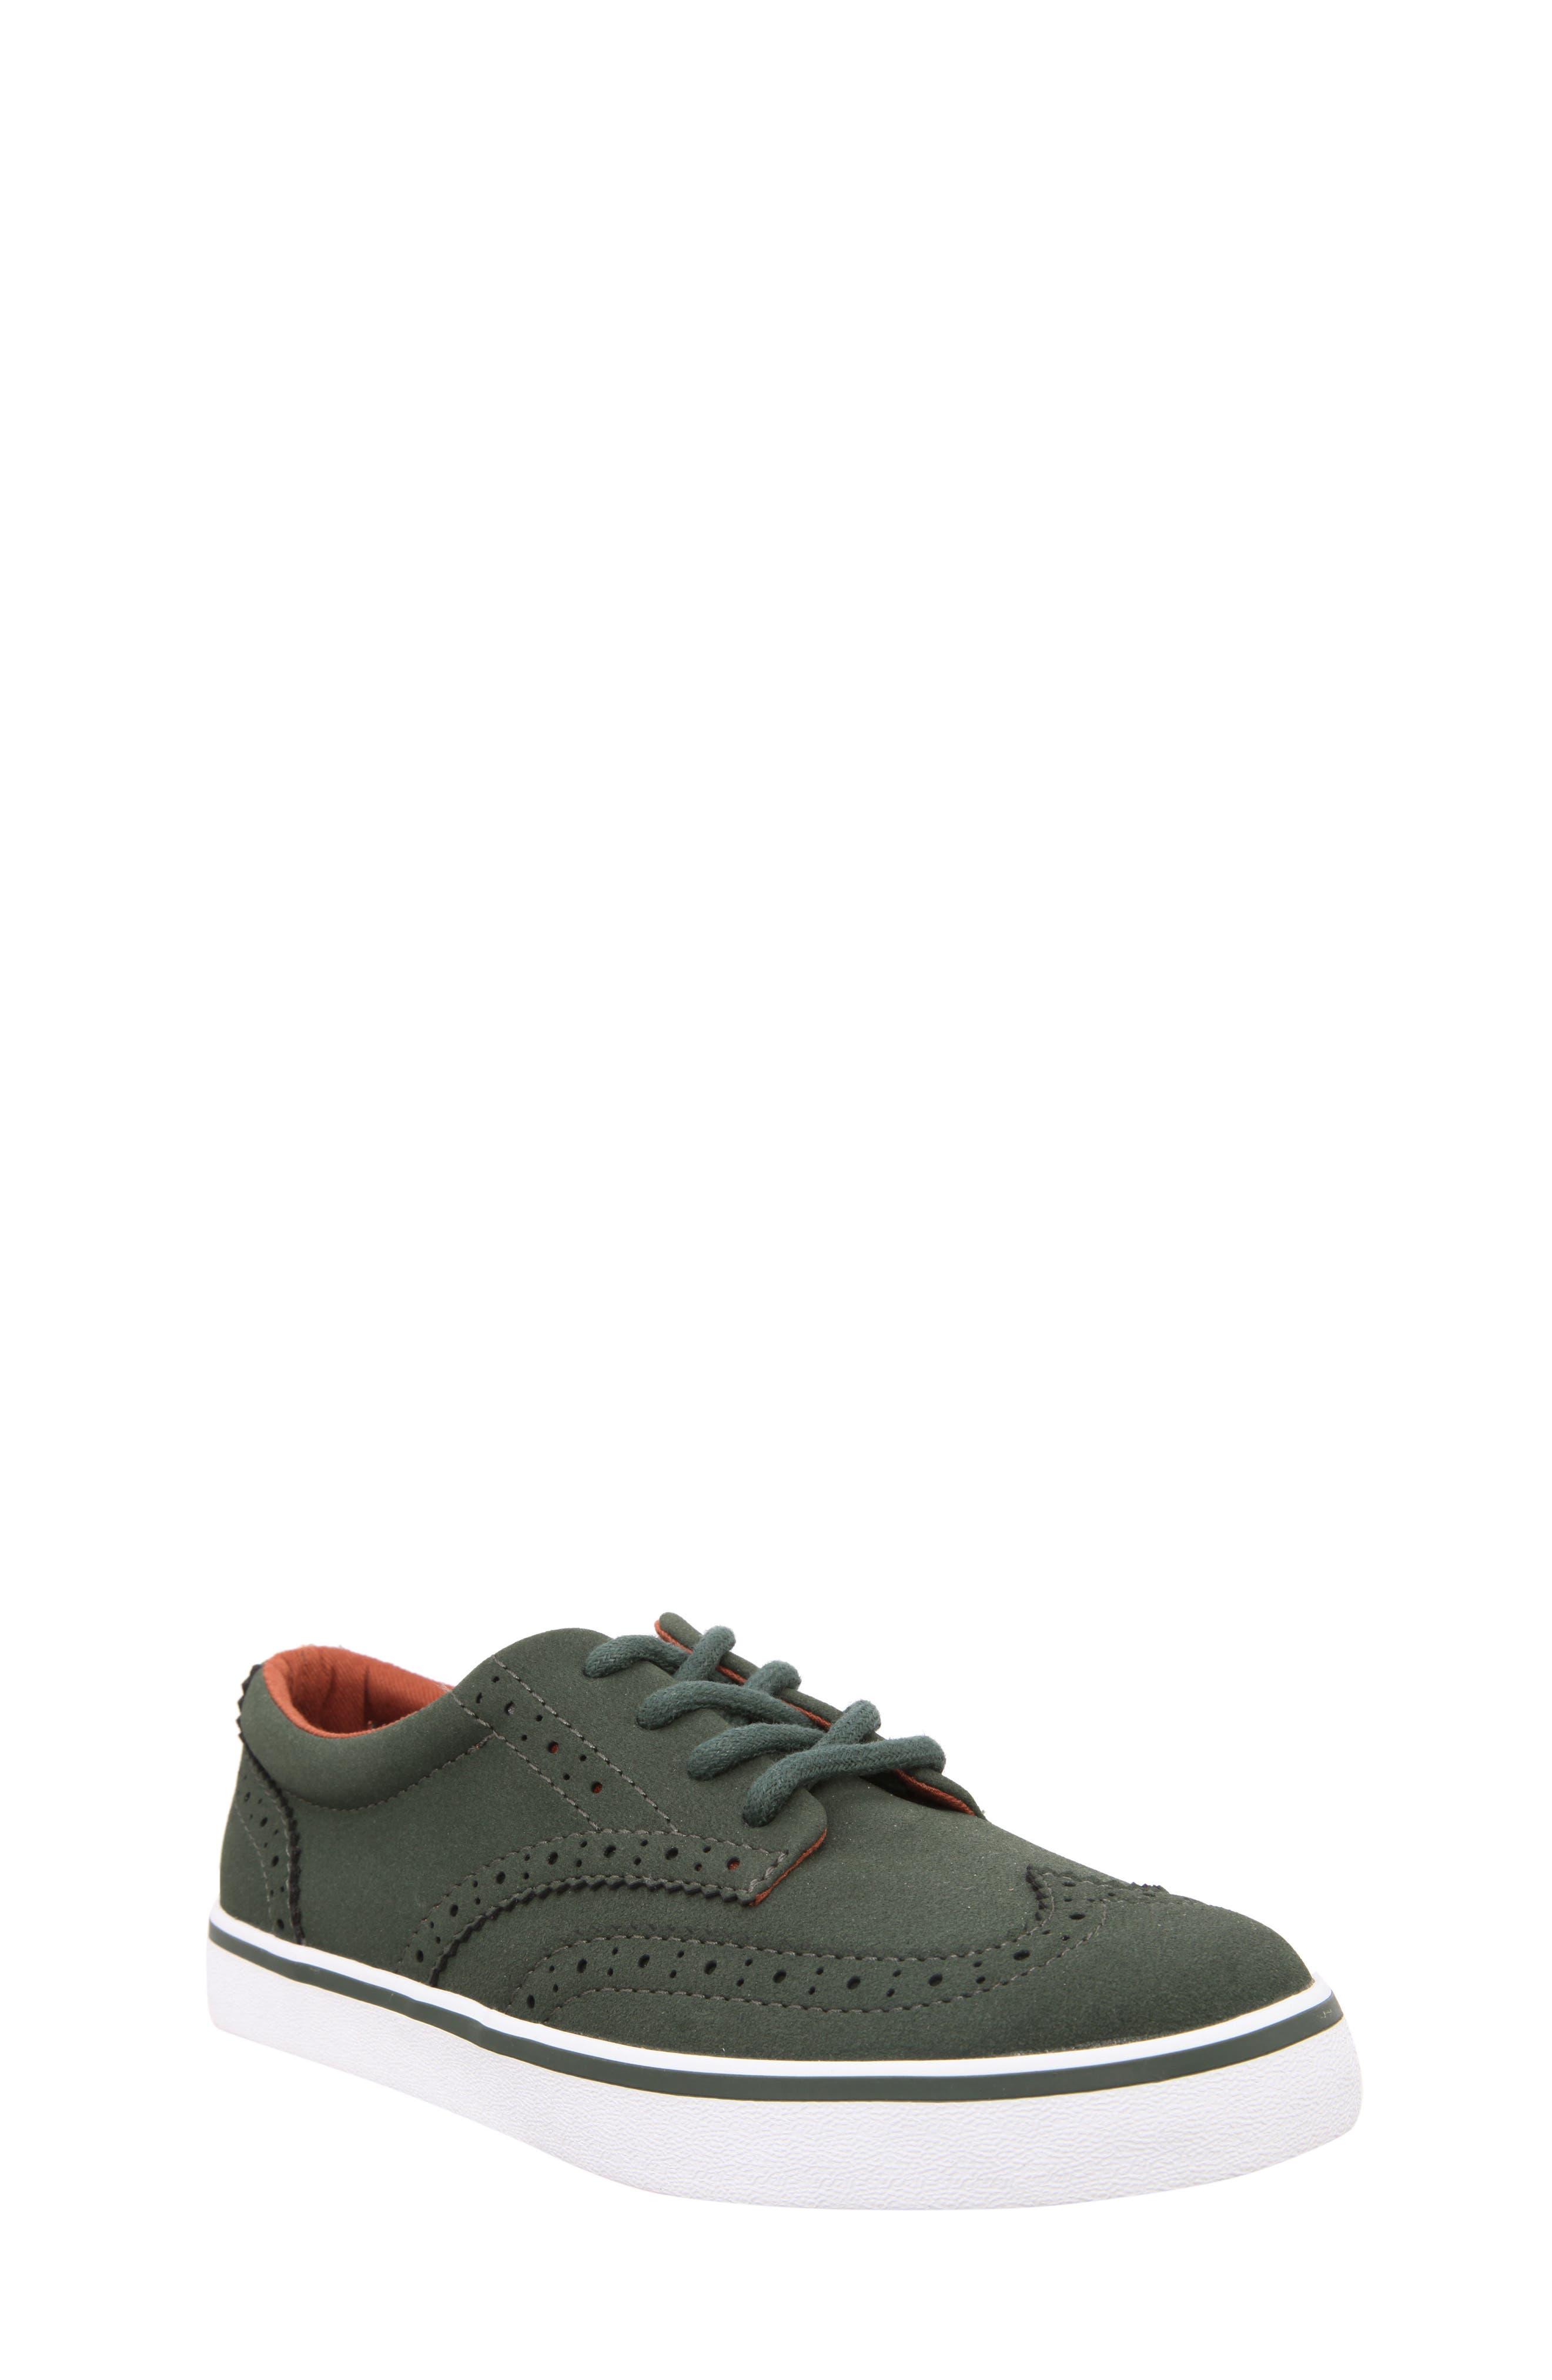 Wingtip Sneaker,                             Main thumbnail 1, color,                             Olive Faux Suede